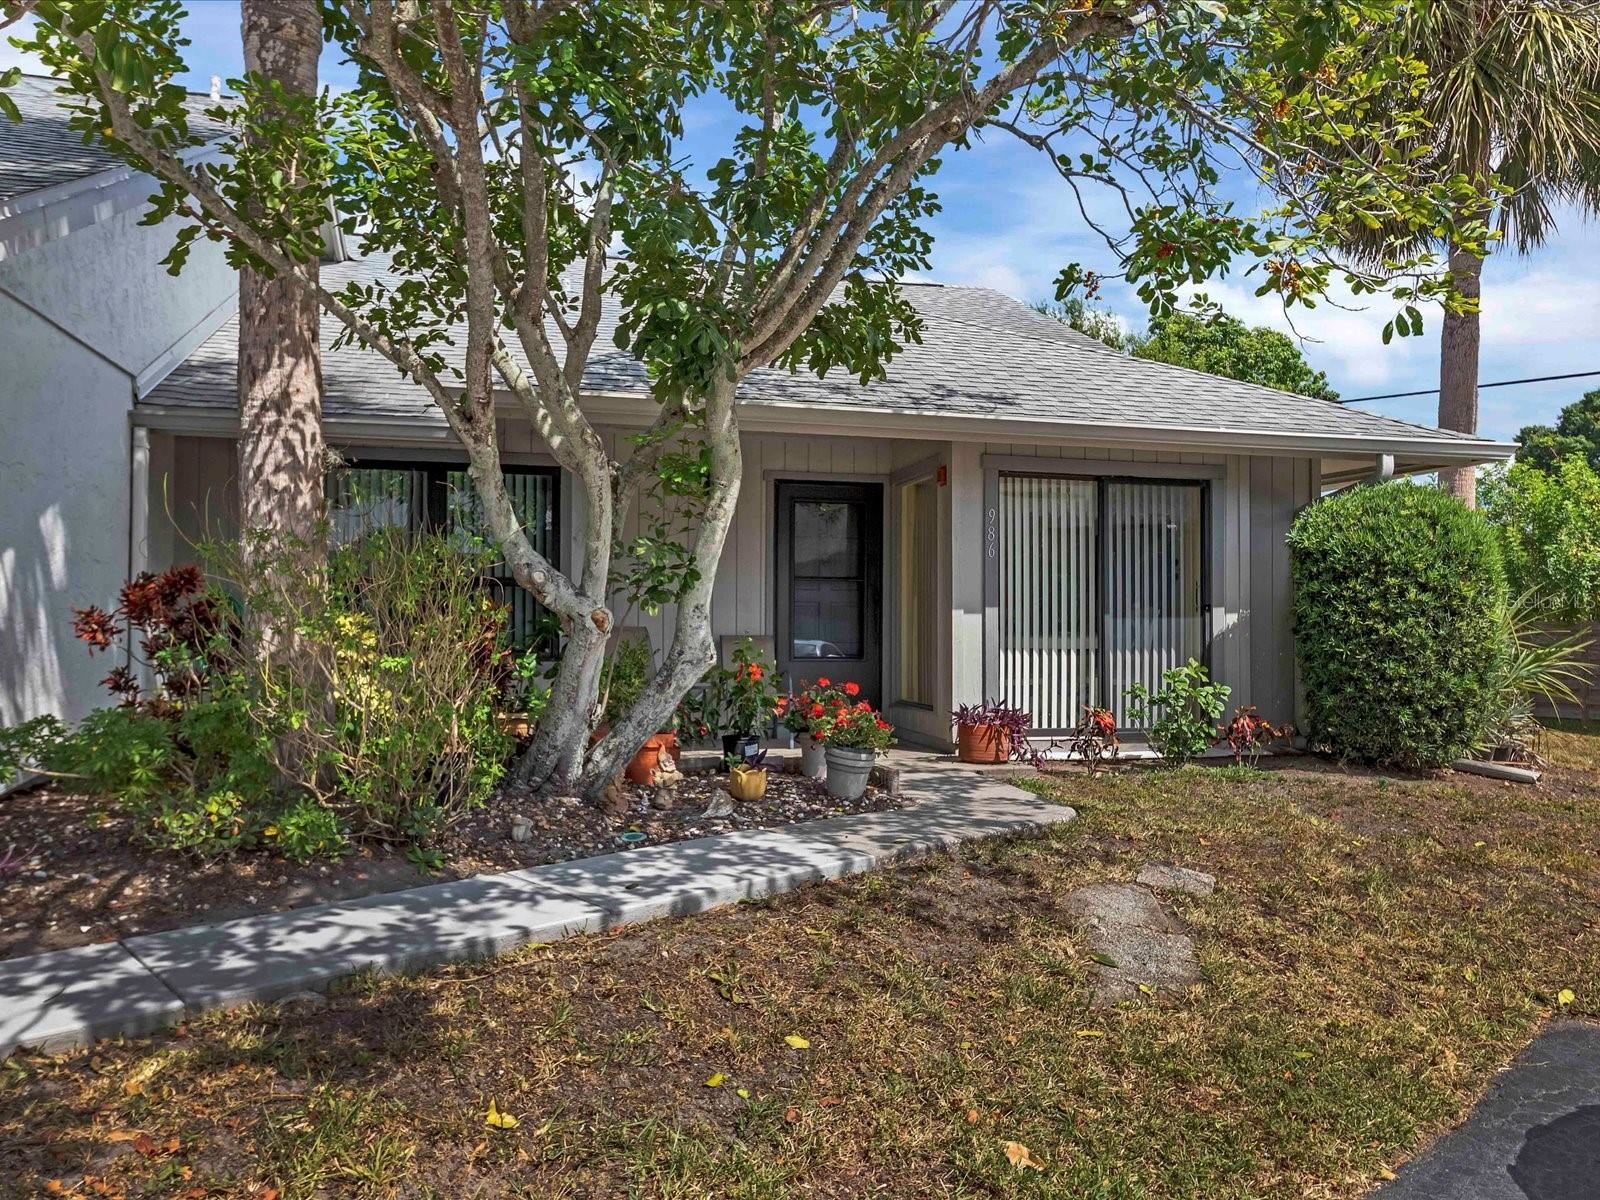 986 N BENEVA ROAD #V-6, Sarasota, FL 34232 - #: A4502679